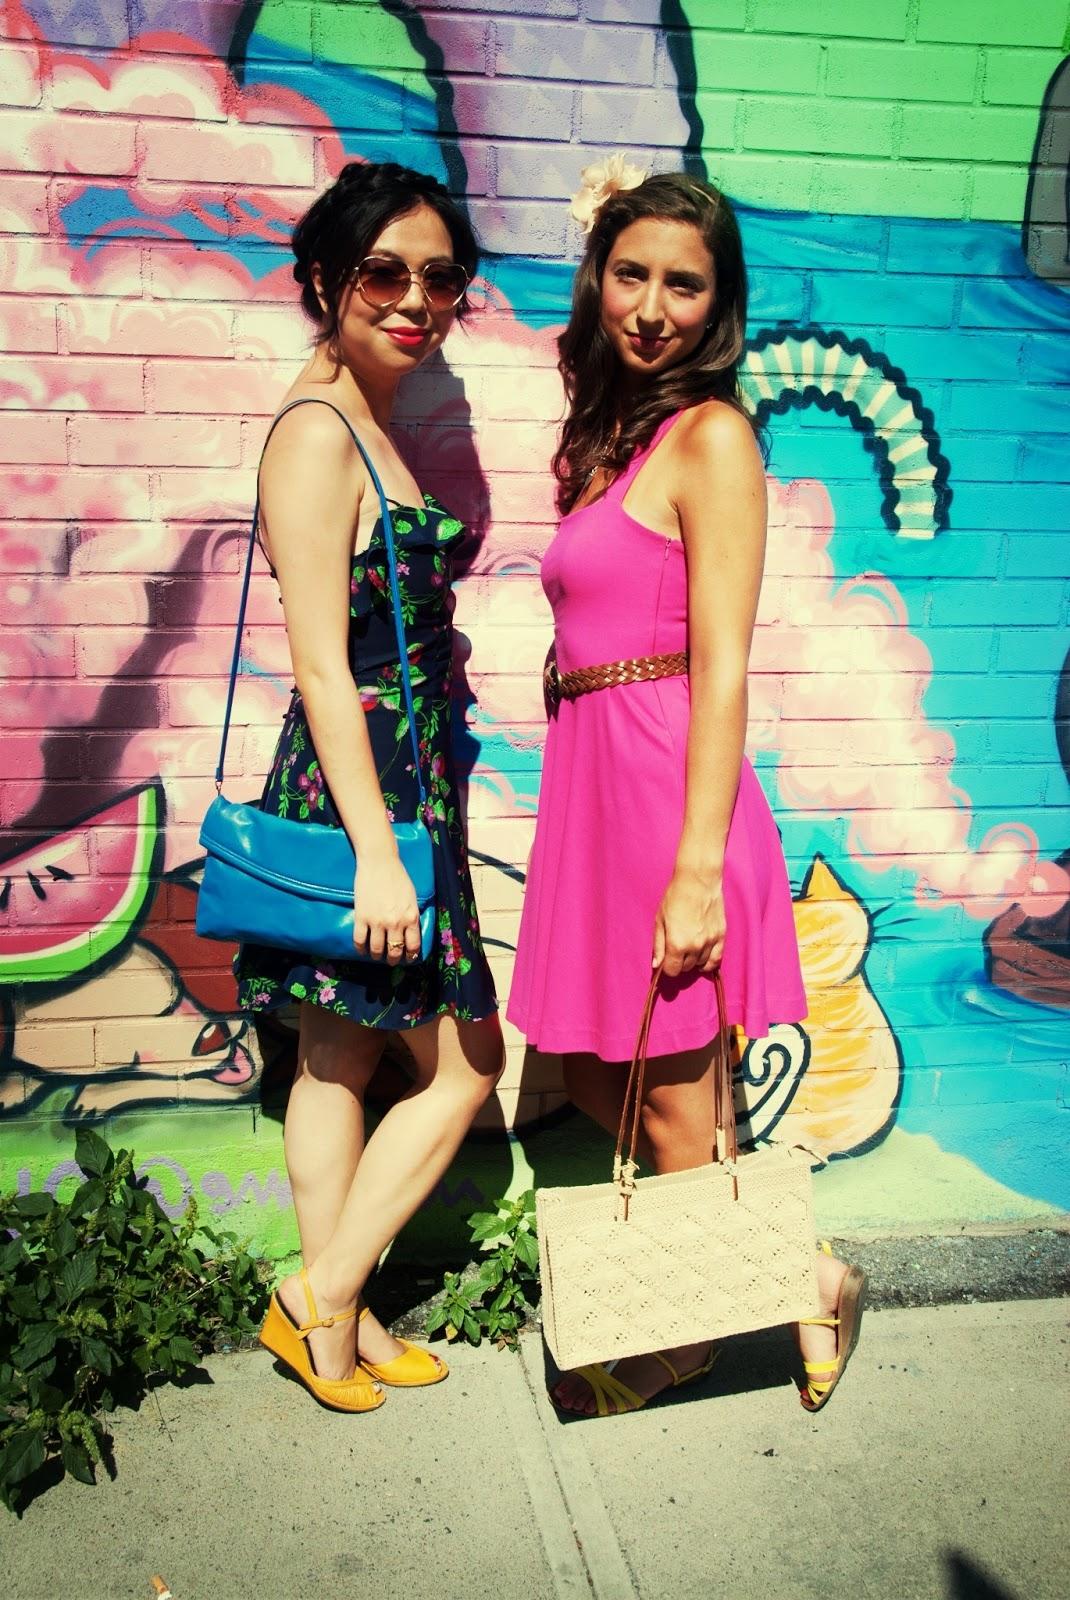 pink dress navy grape dress heart sunglasses floral headband graffiti bubble gum